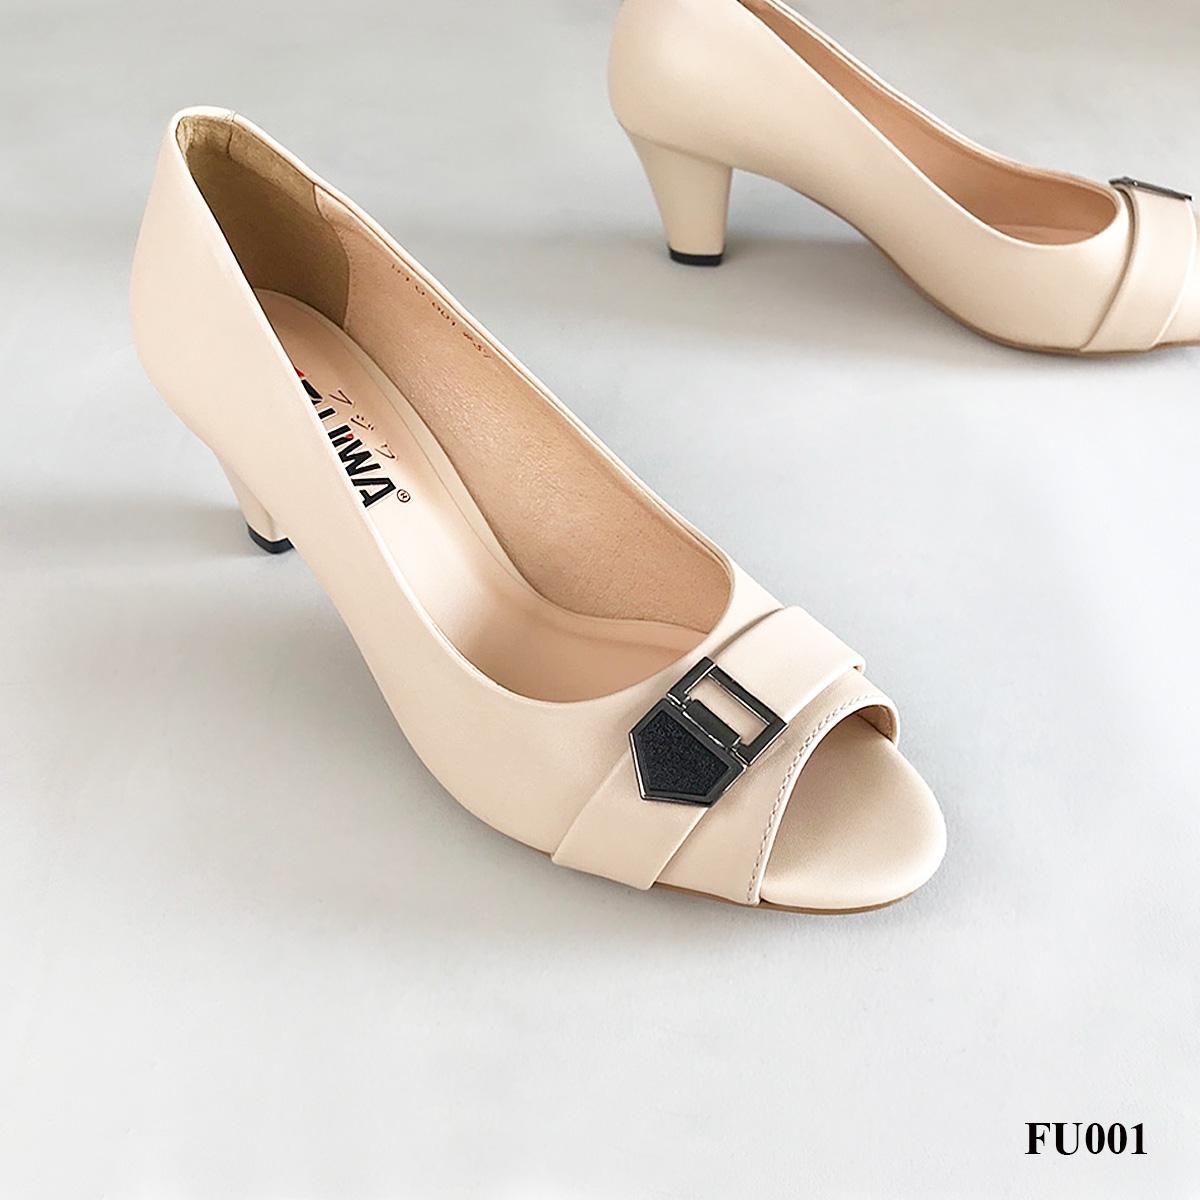 Giày Nữ Fujiwa FU001